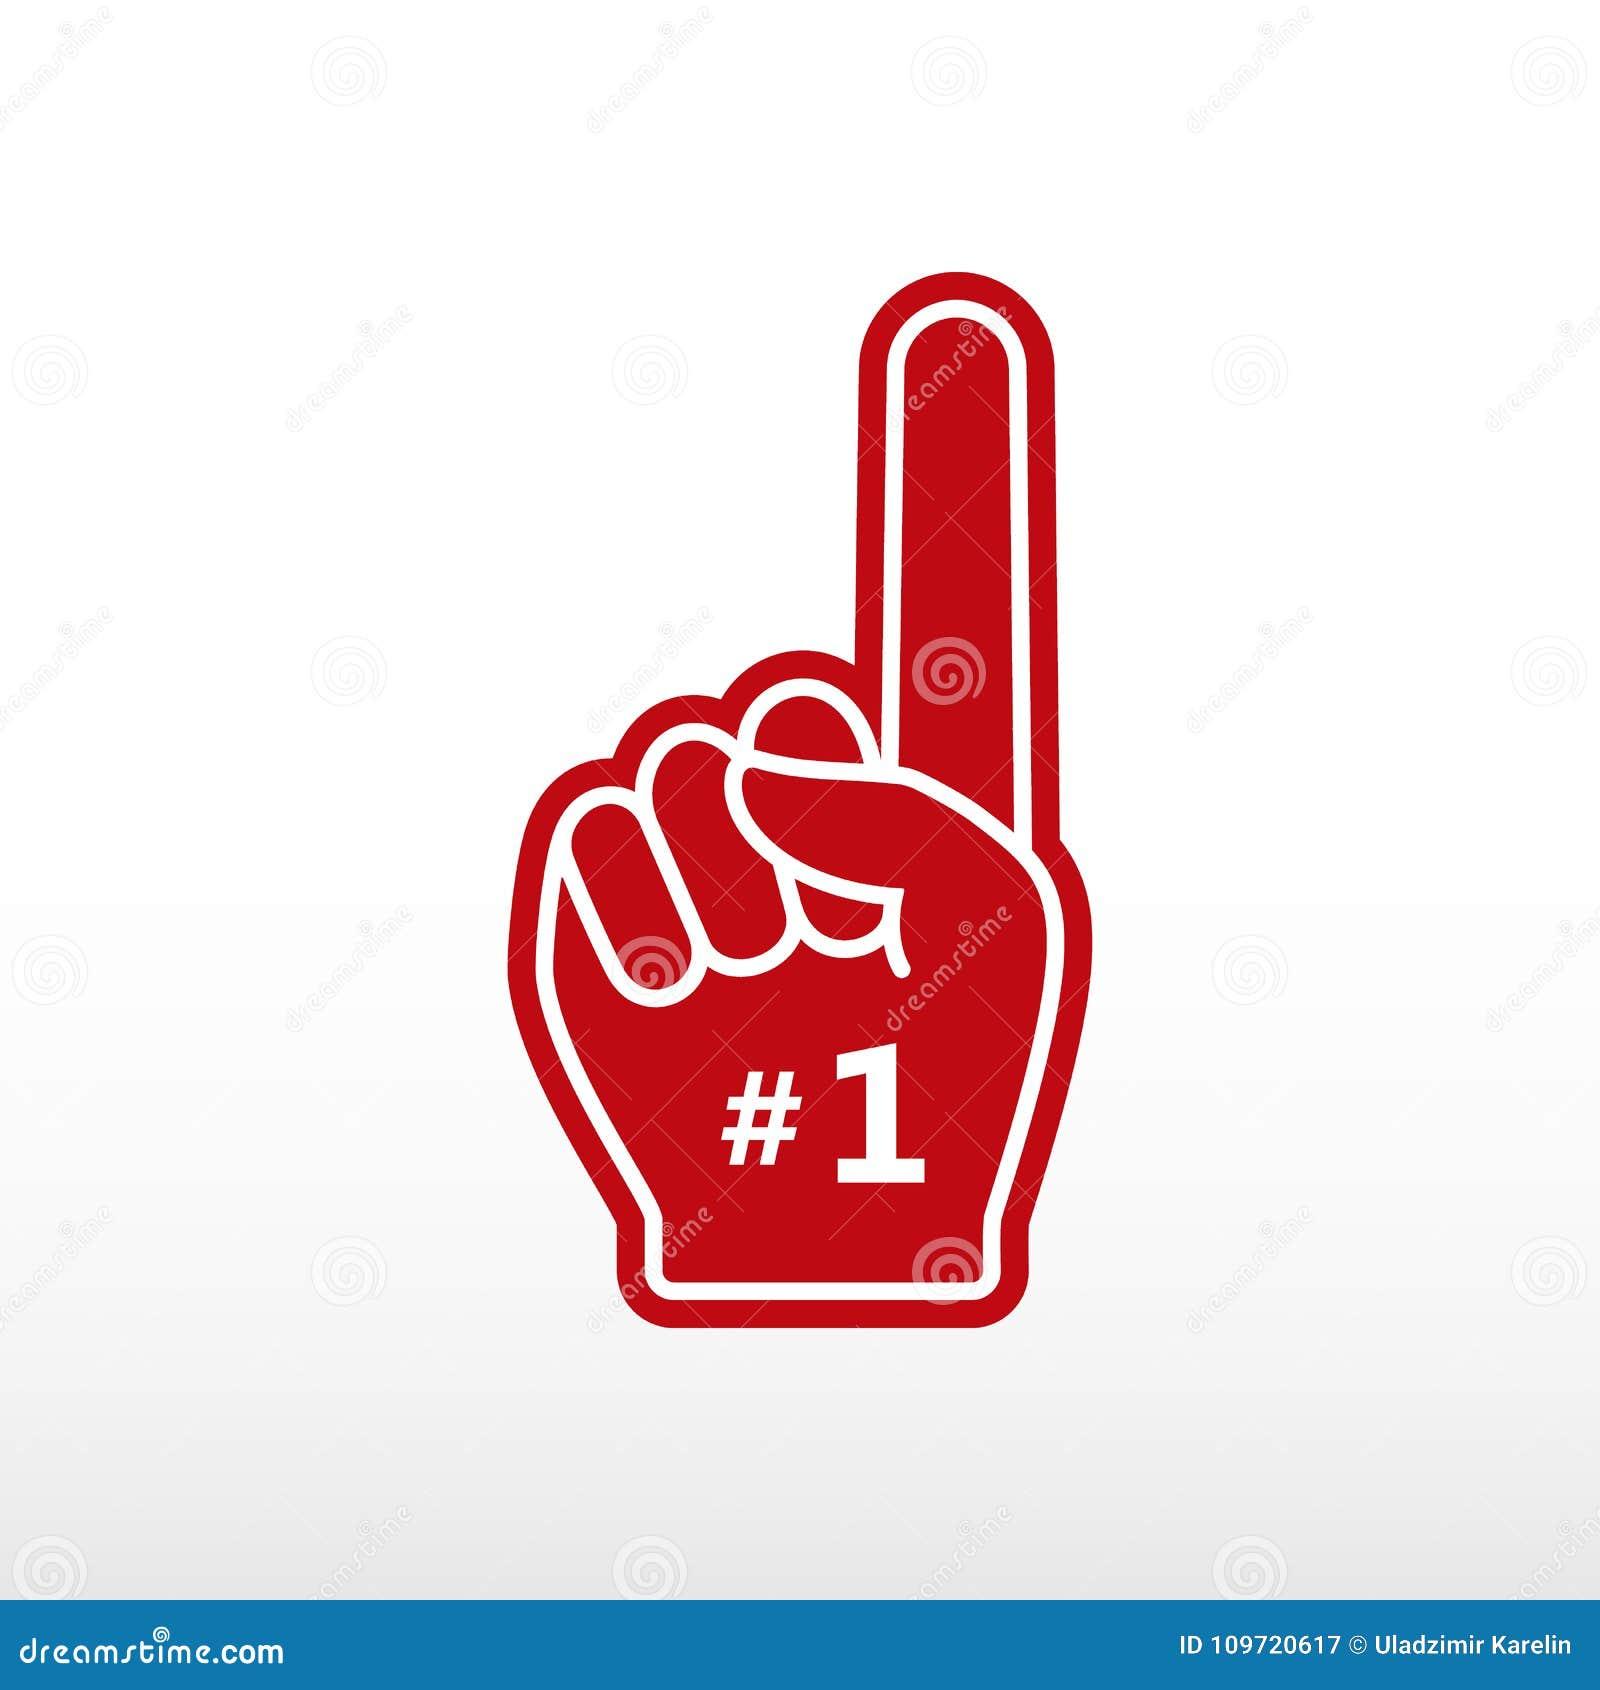 Skumfinger Numrera 1, handske med fingret som framlänges lyfts, fanhanden